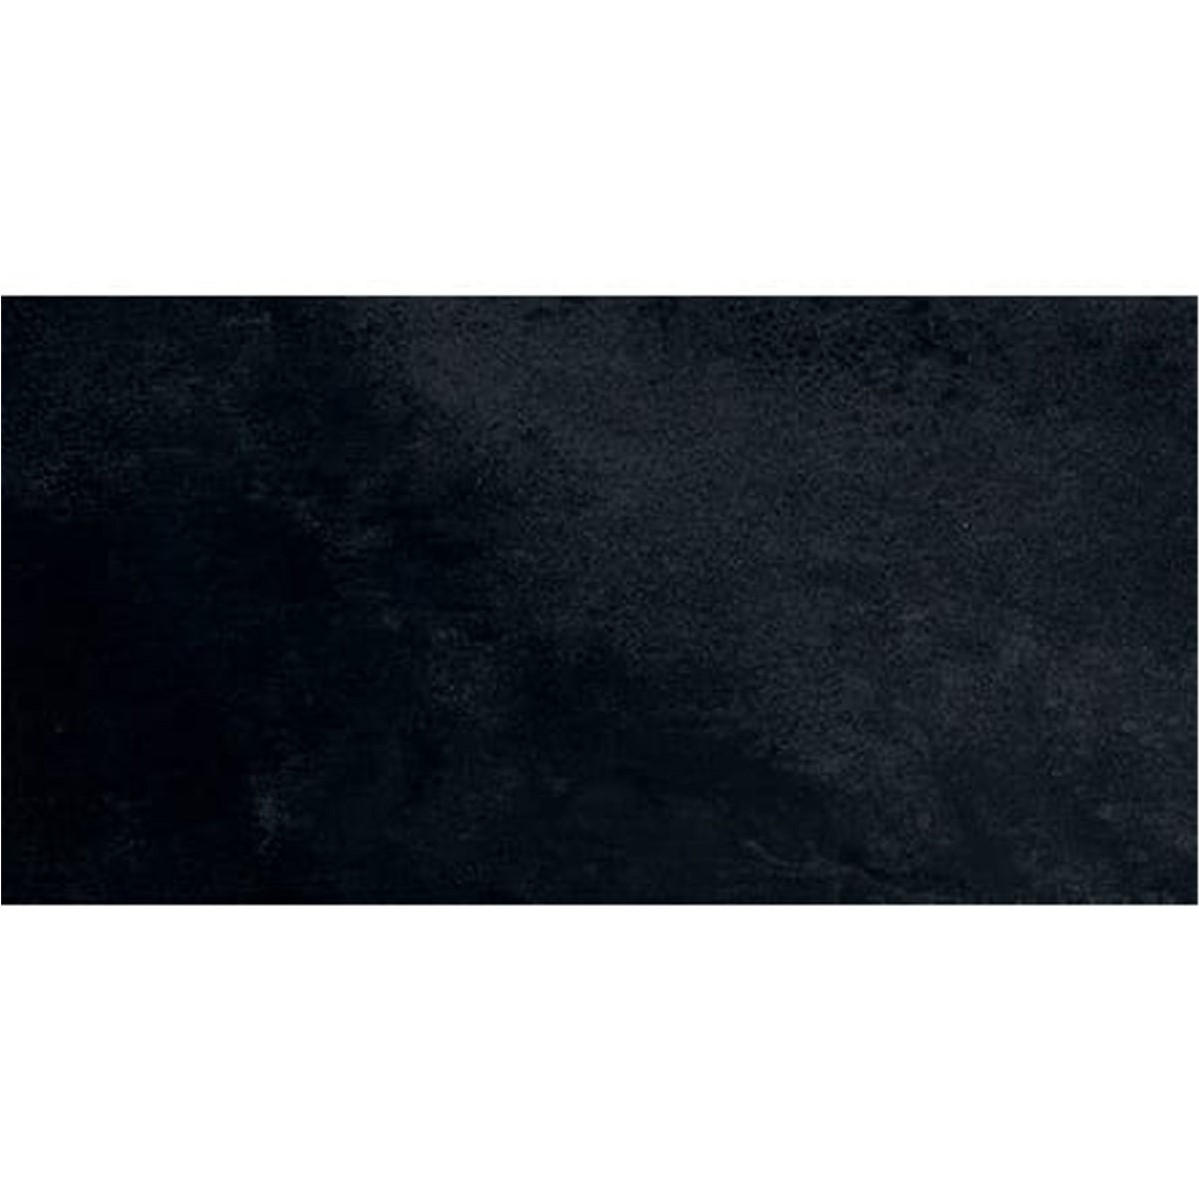 T10194 RAIN BLACK